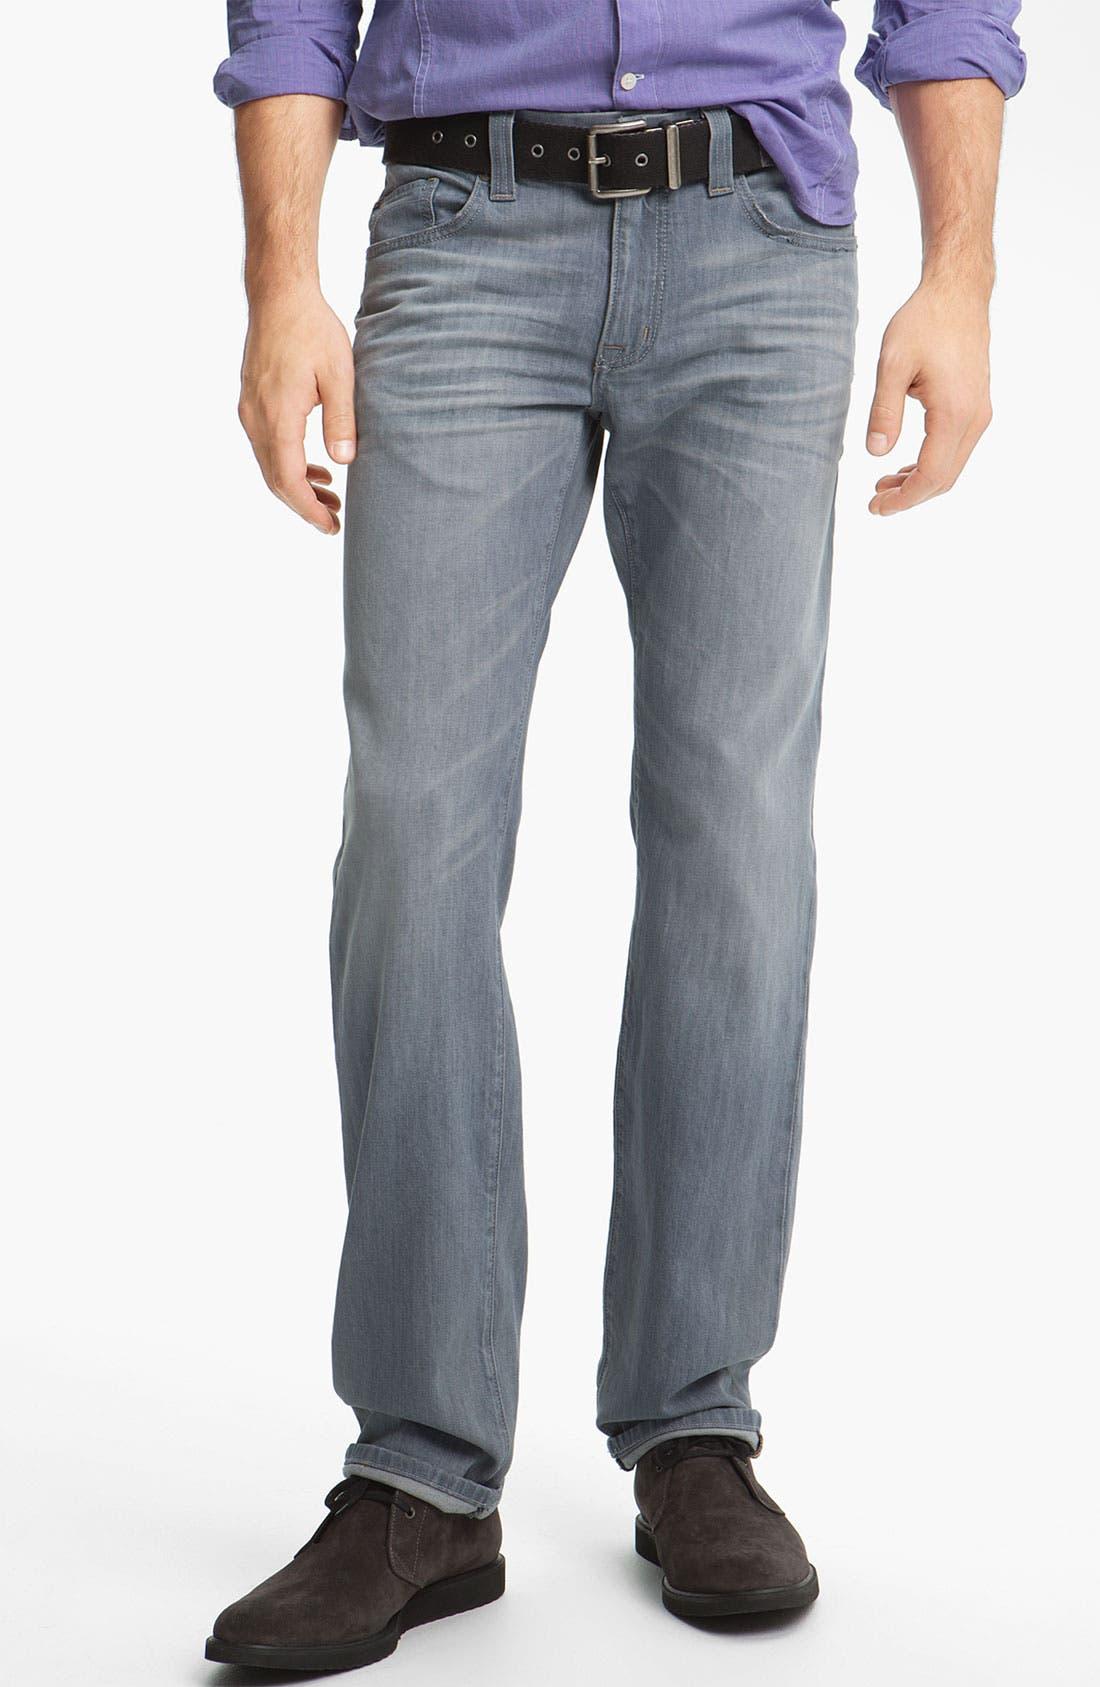 Alternate Image 1 Selected - Fidelity Denim 'Impala' Straight Leg Jeans (Voodoo Ghost)